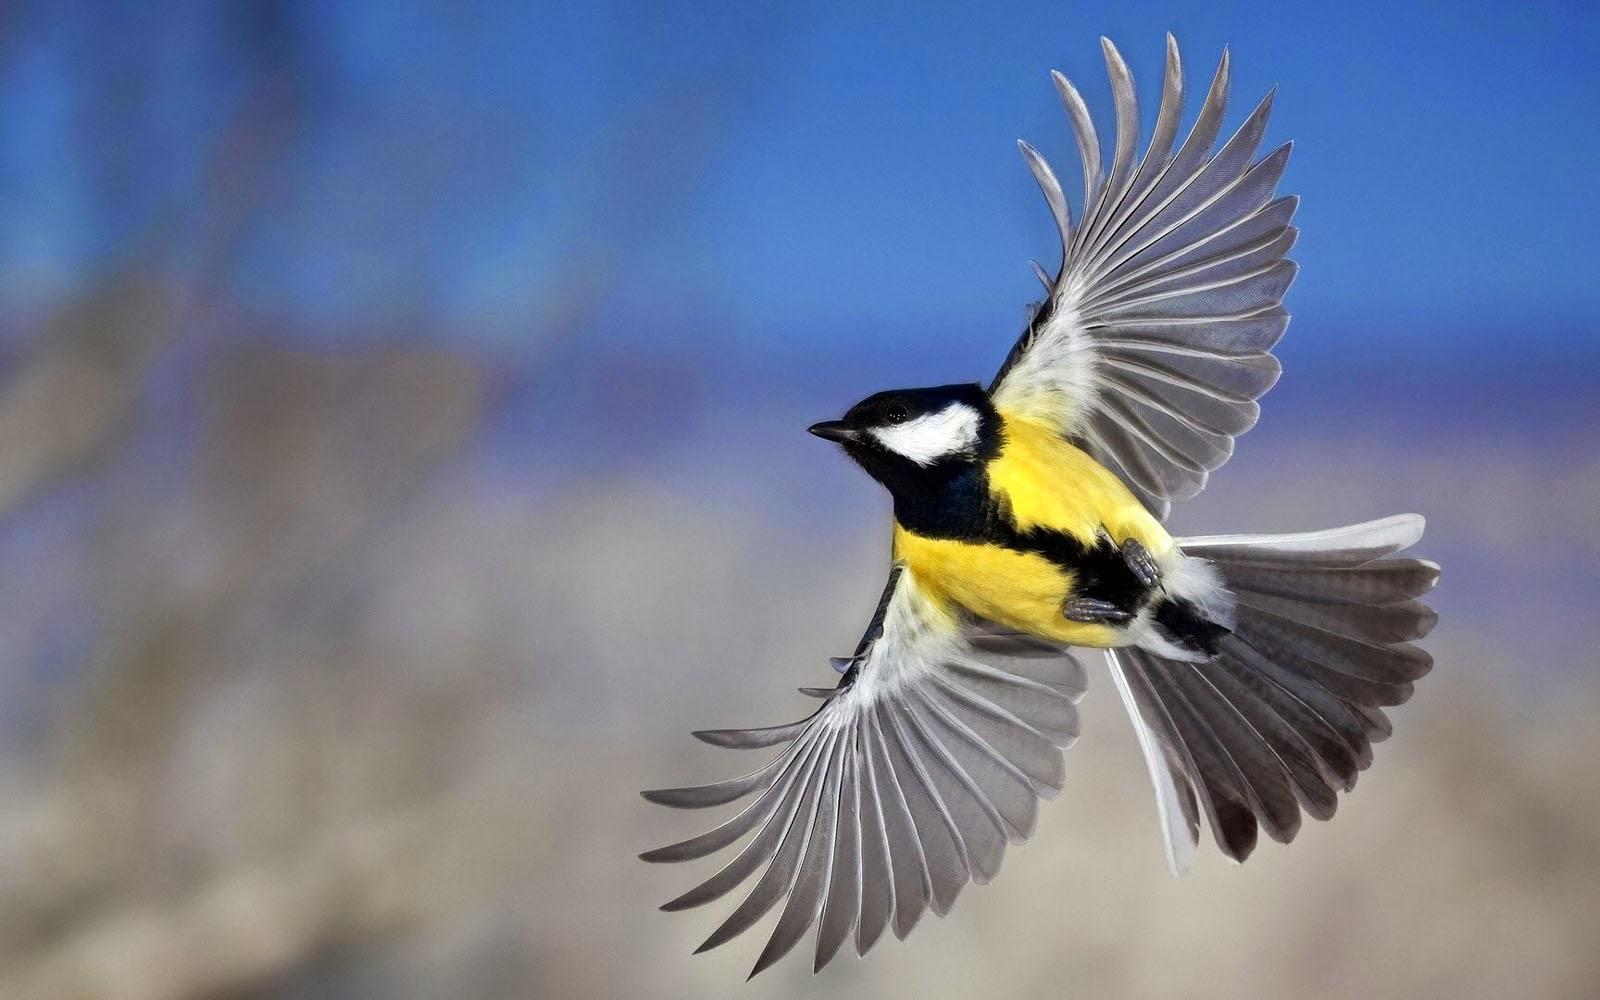 Wallpapers: Flying Birds Wallpapers